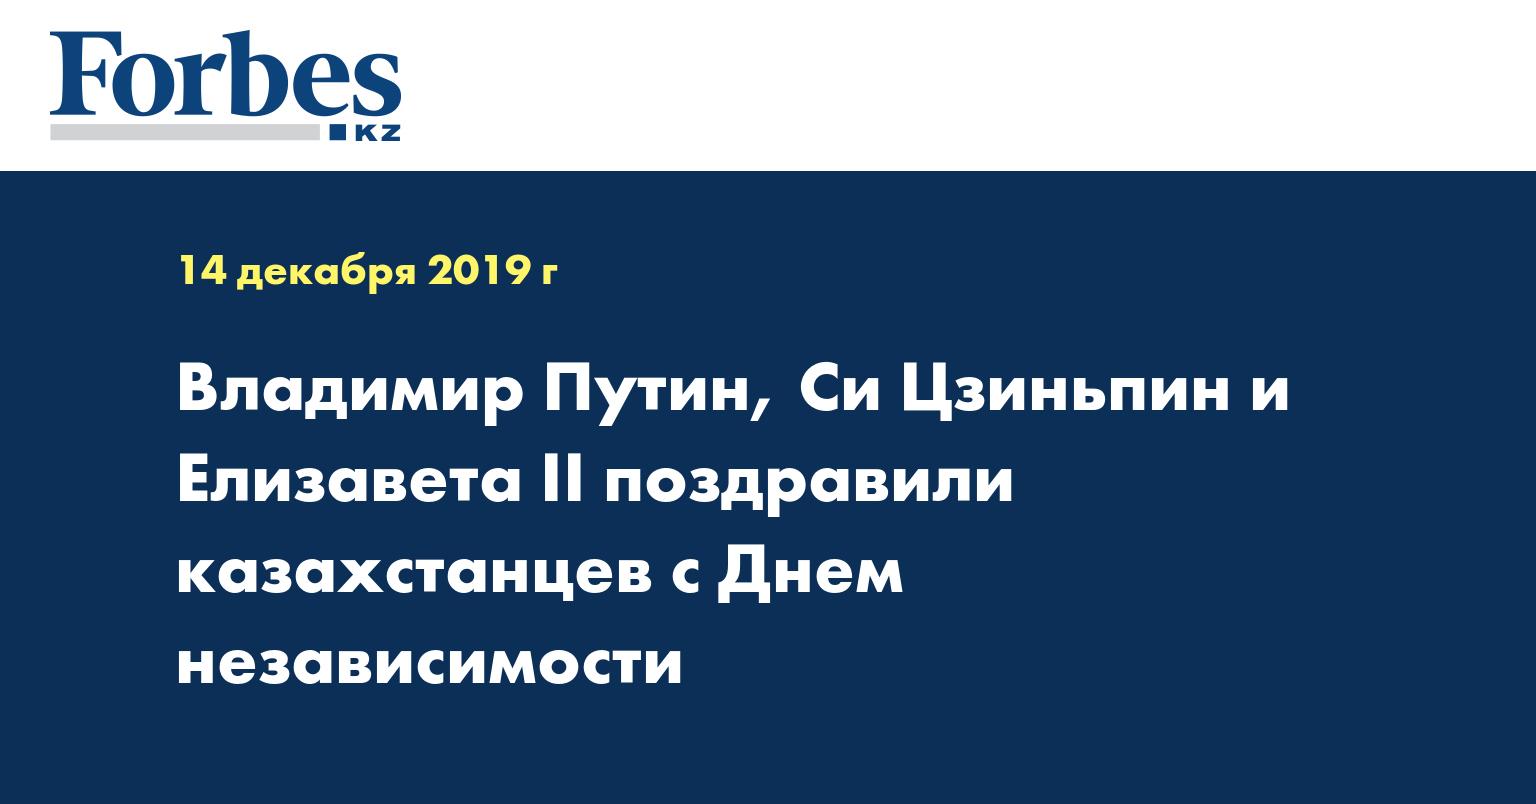 Владимир Путин, Си Цзиньпин и Елизавета ІІ поздравили казахстанцев с Днем независимости